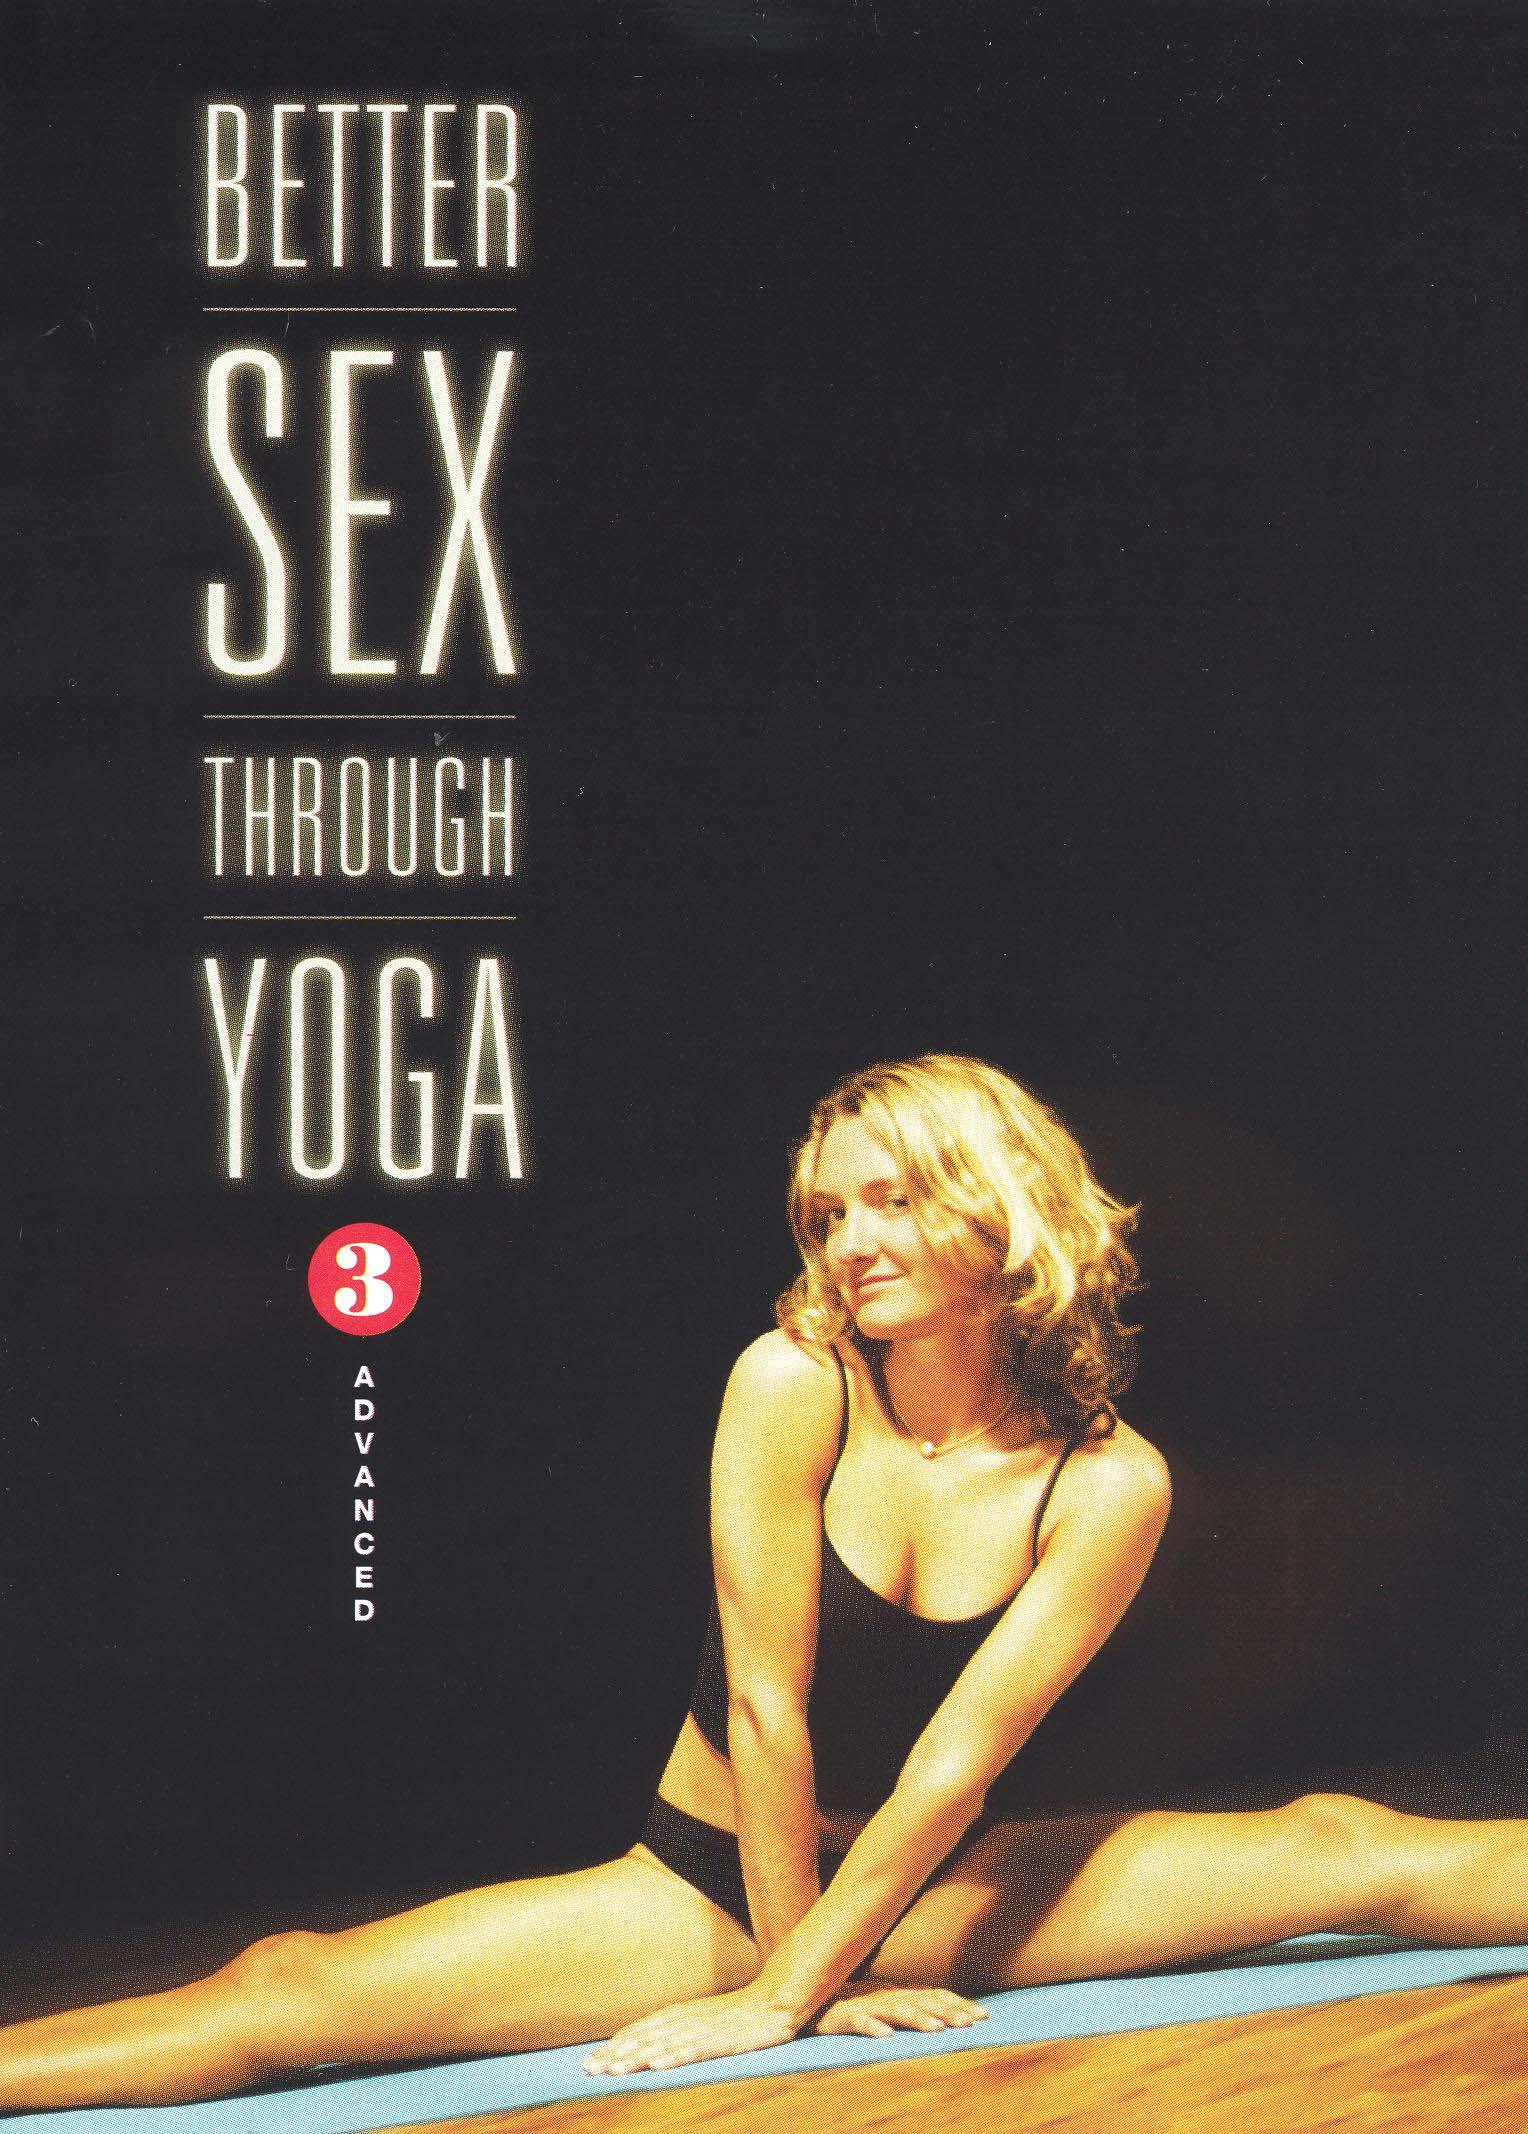 Better Sex Through Yoga, Vol. 3: Advanced